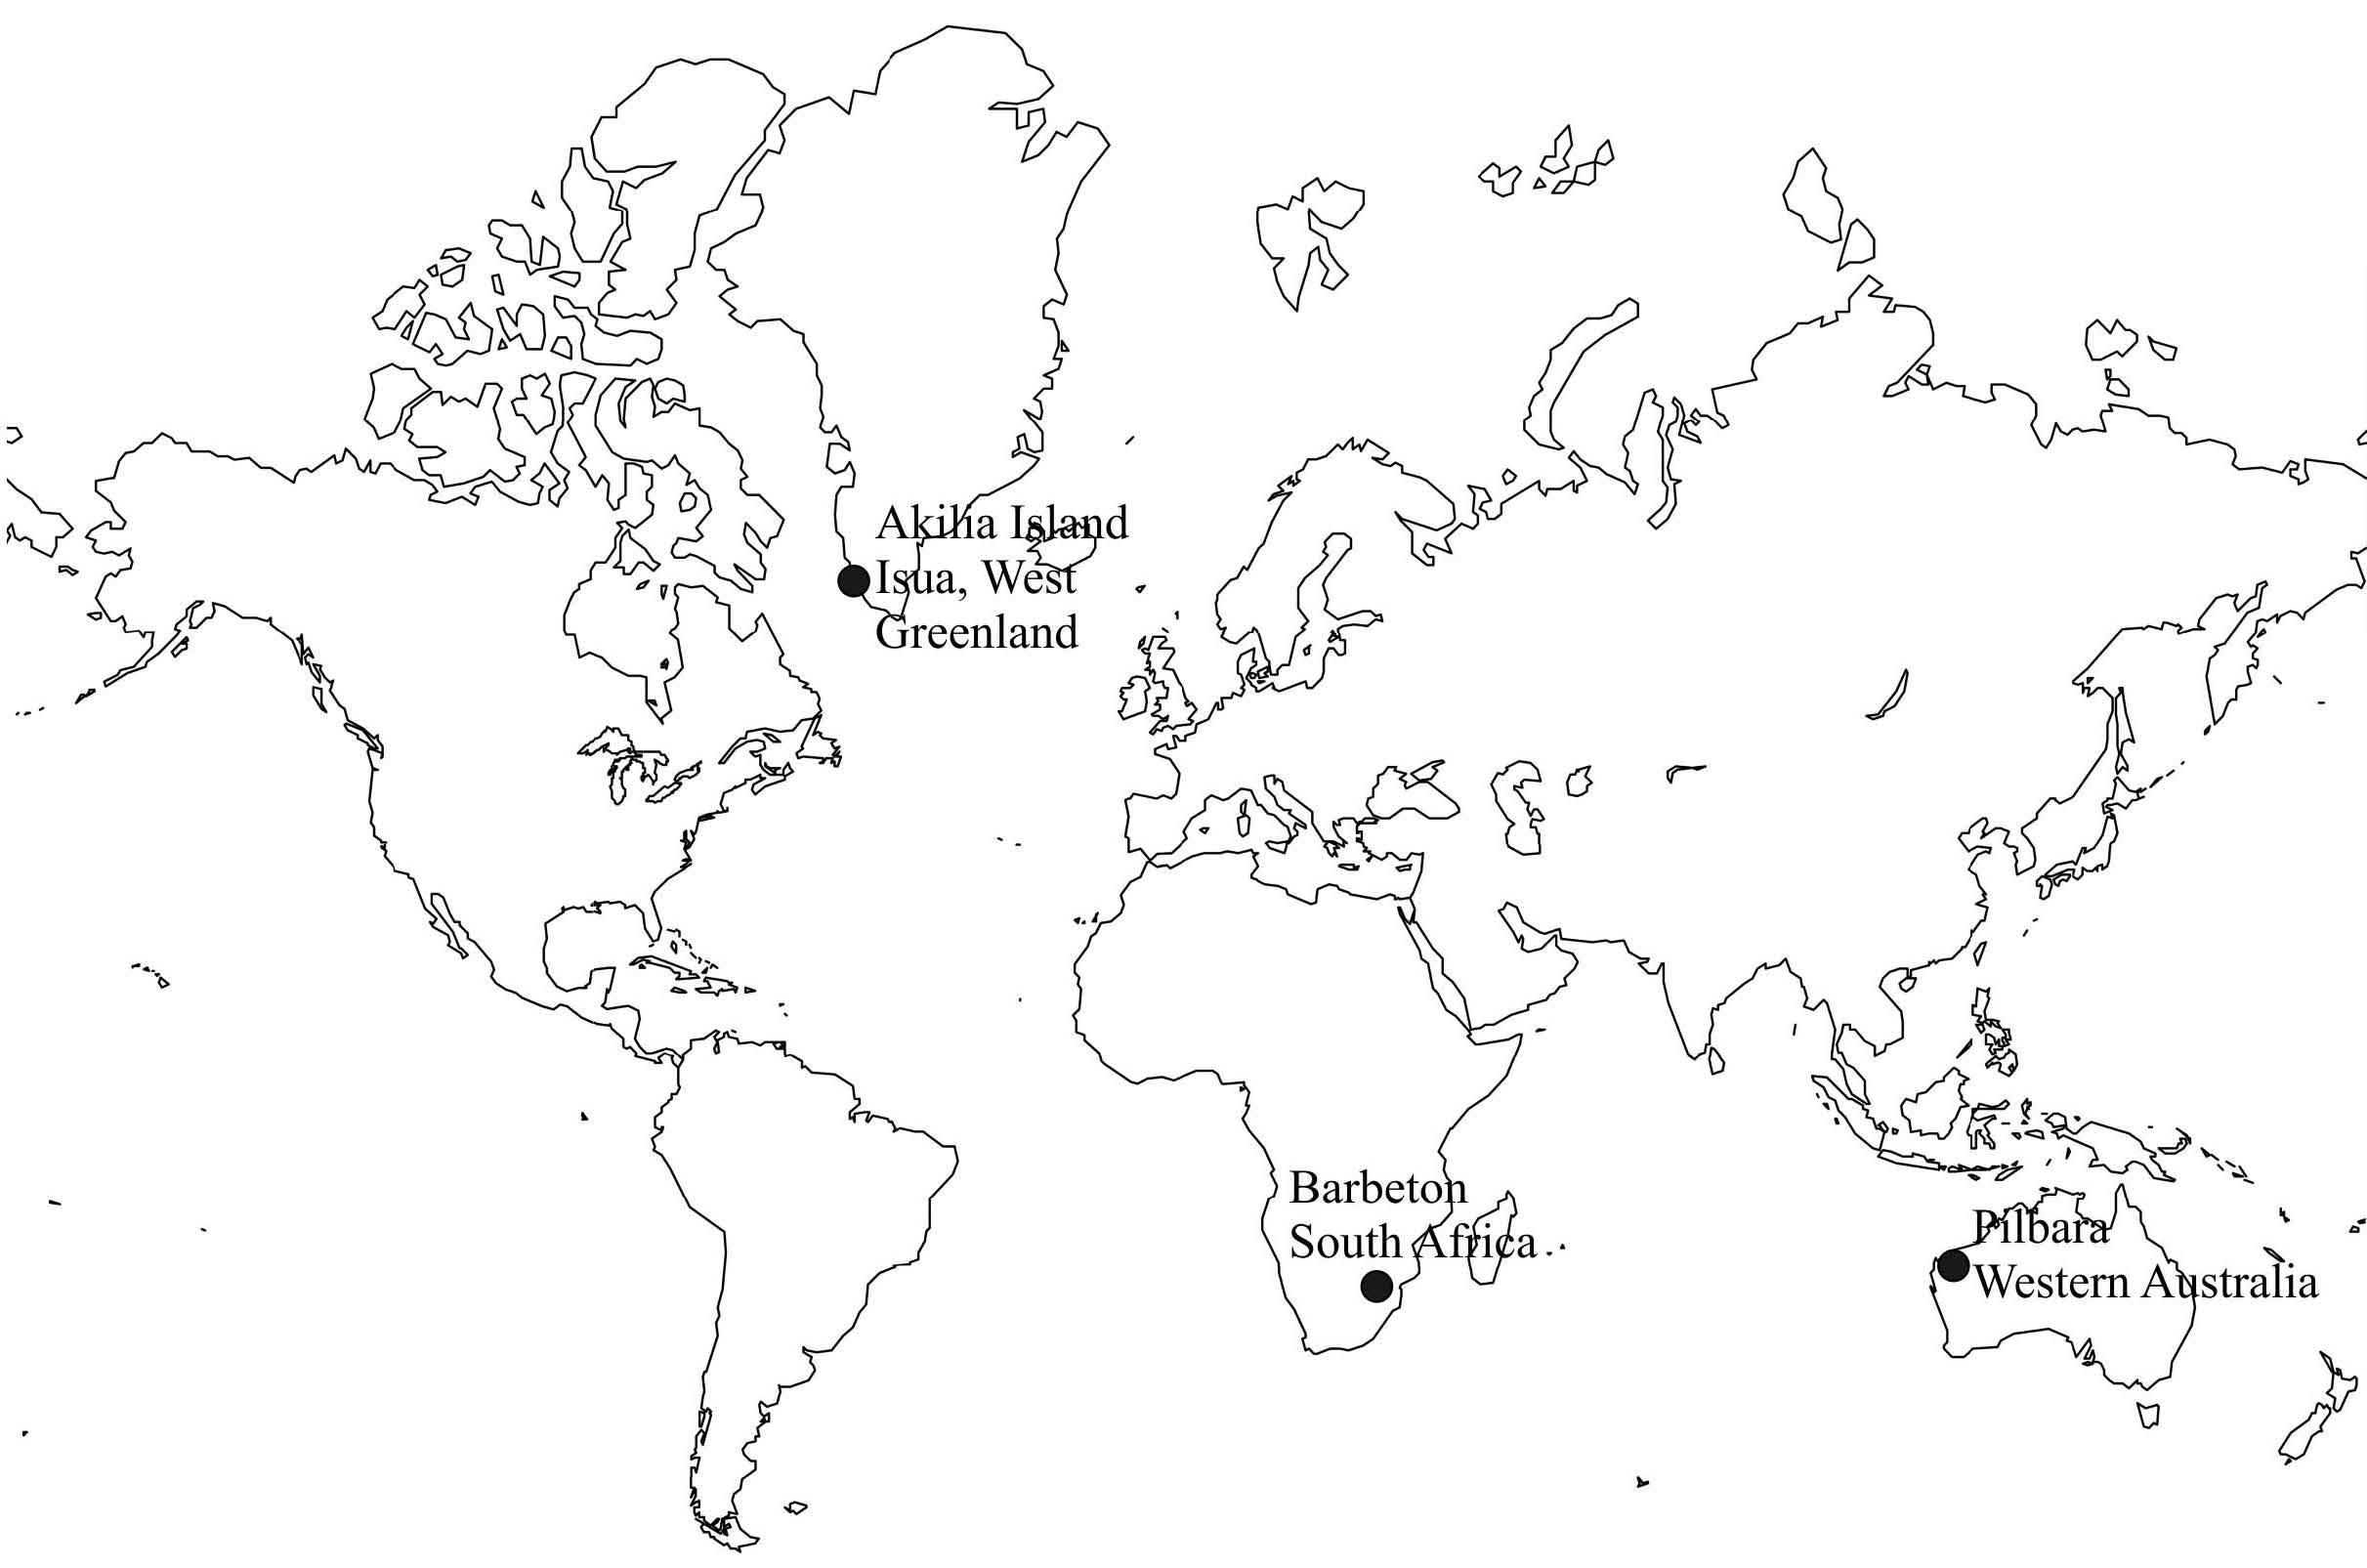 Figure 1 location of the three sites with eoarchean isua and akilia island greenland and paleoarchean pilbara australia and barberton africa crust